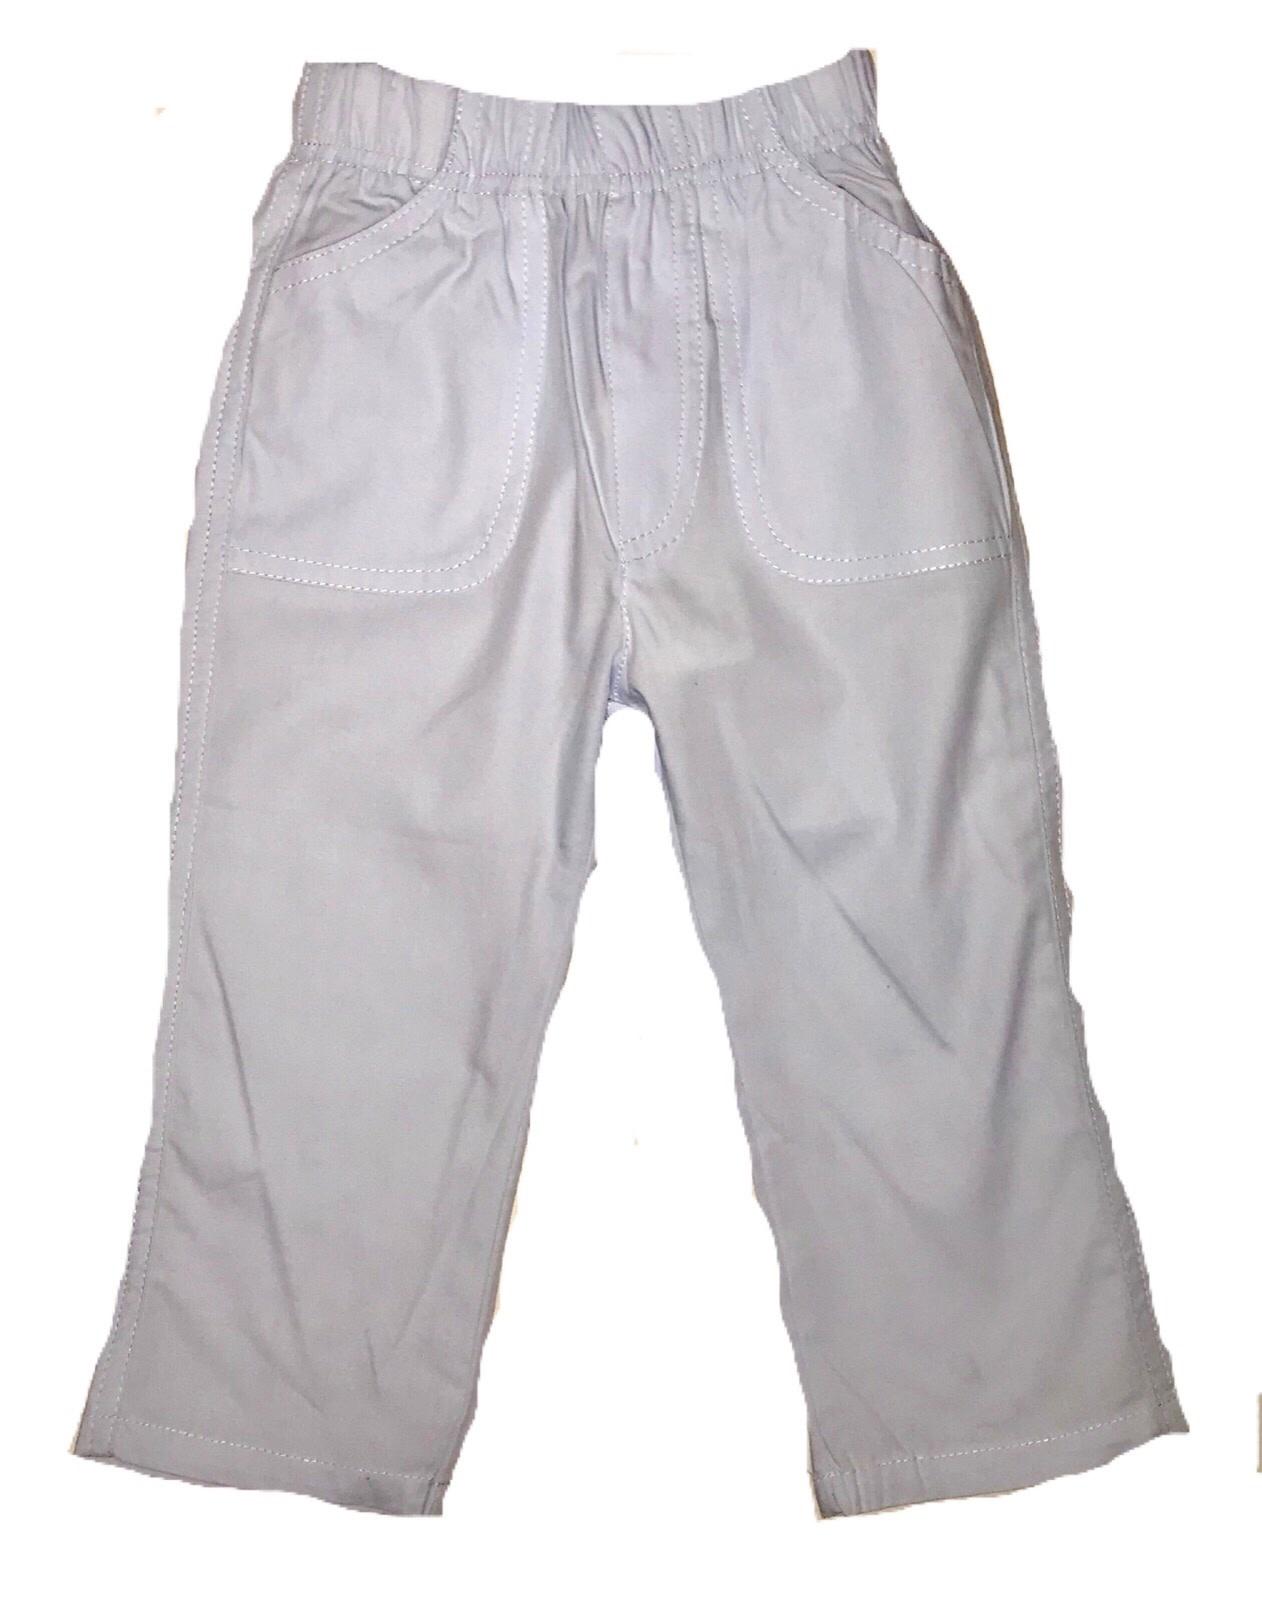 Piruleta Piruleta Pale Blue Trousers